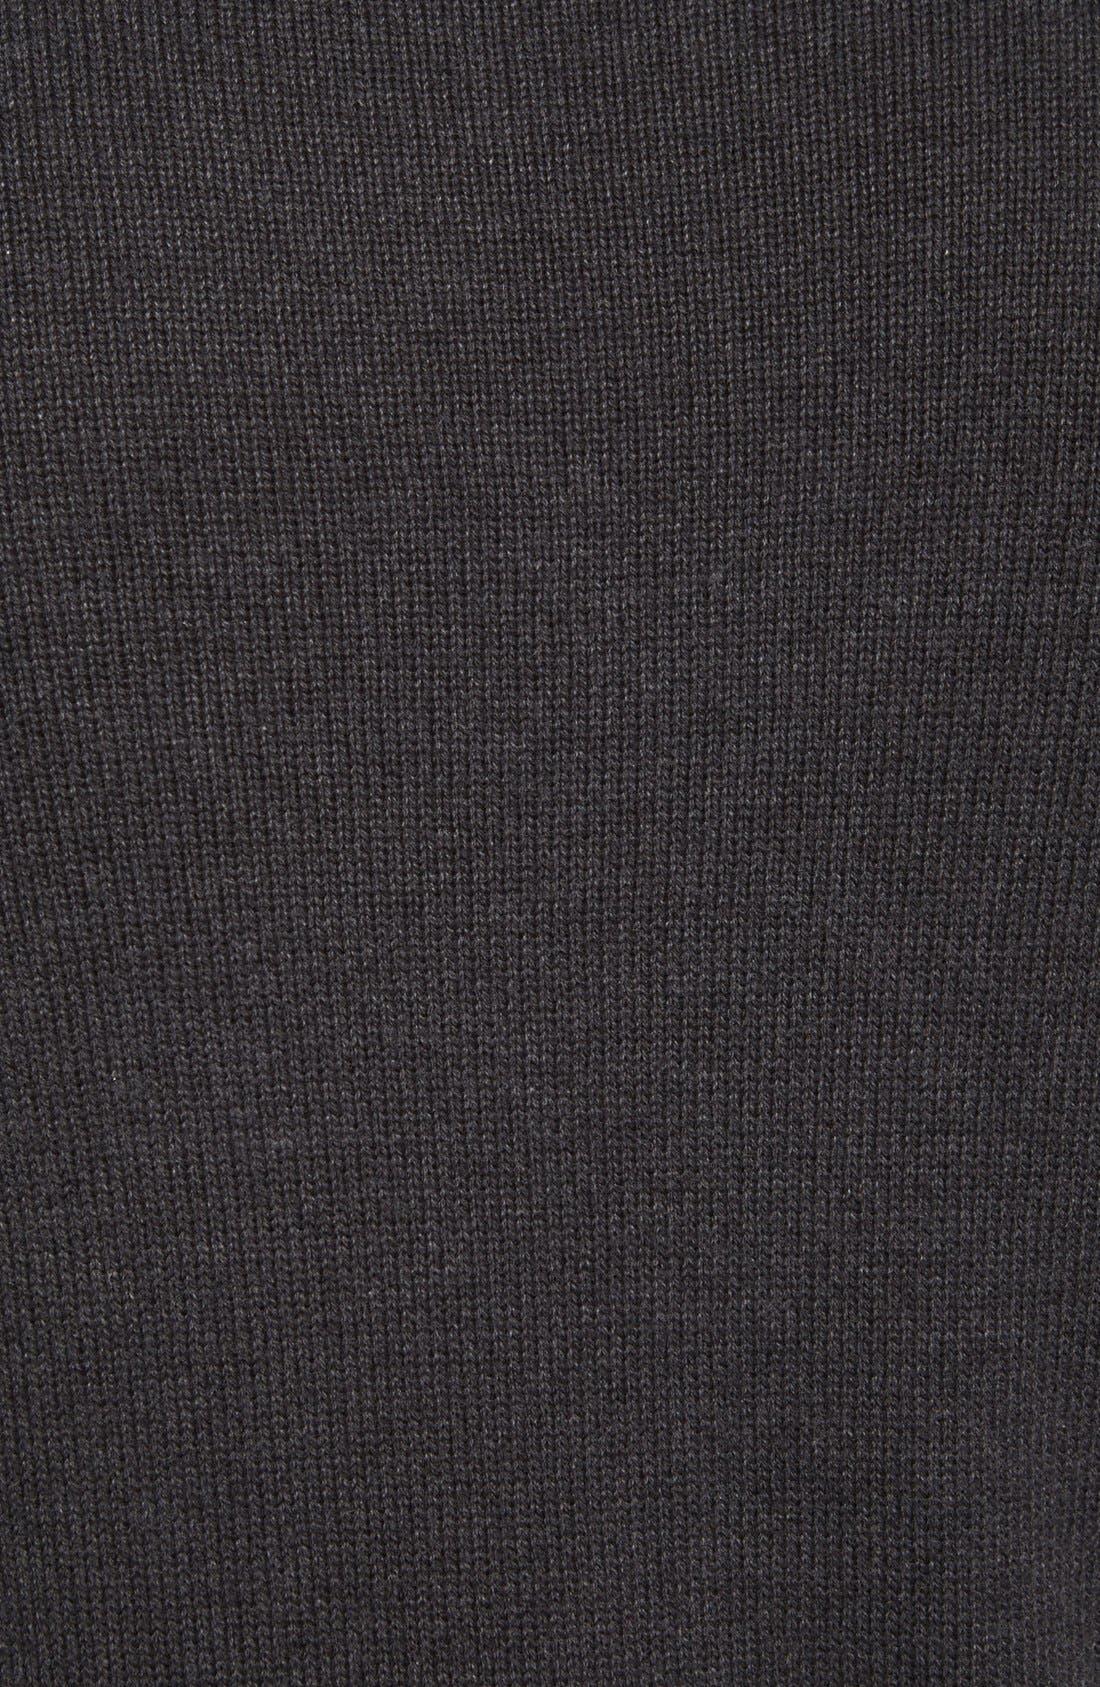 Alternate Image 3  - 1901 Graphic Crewneck Sweater